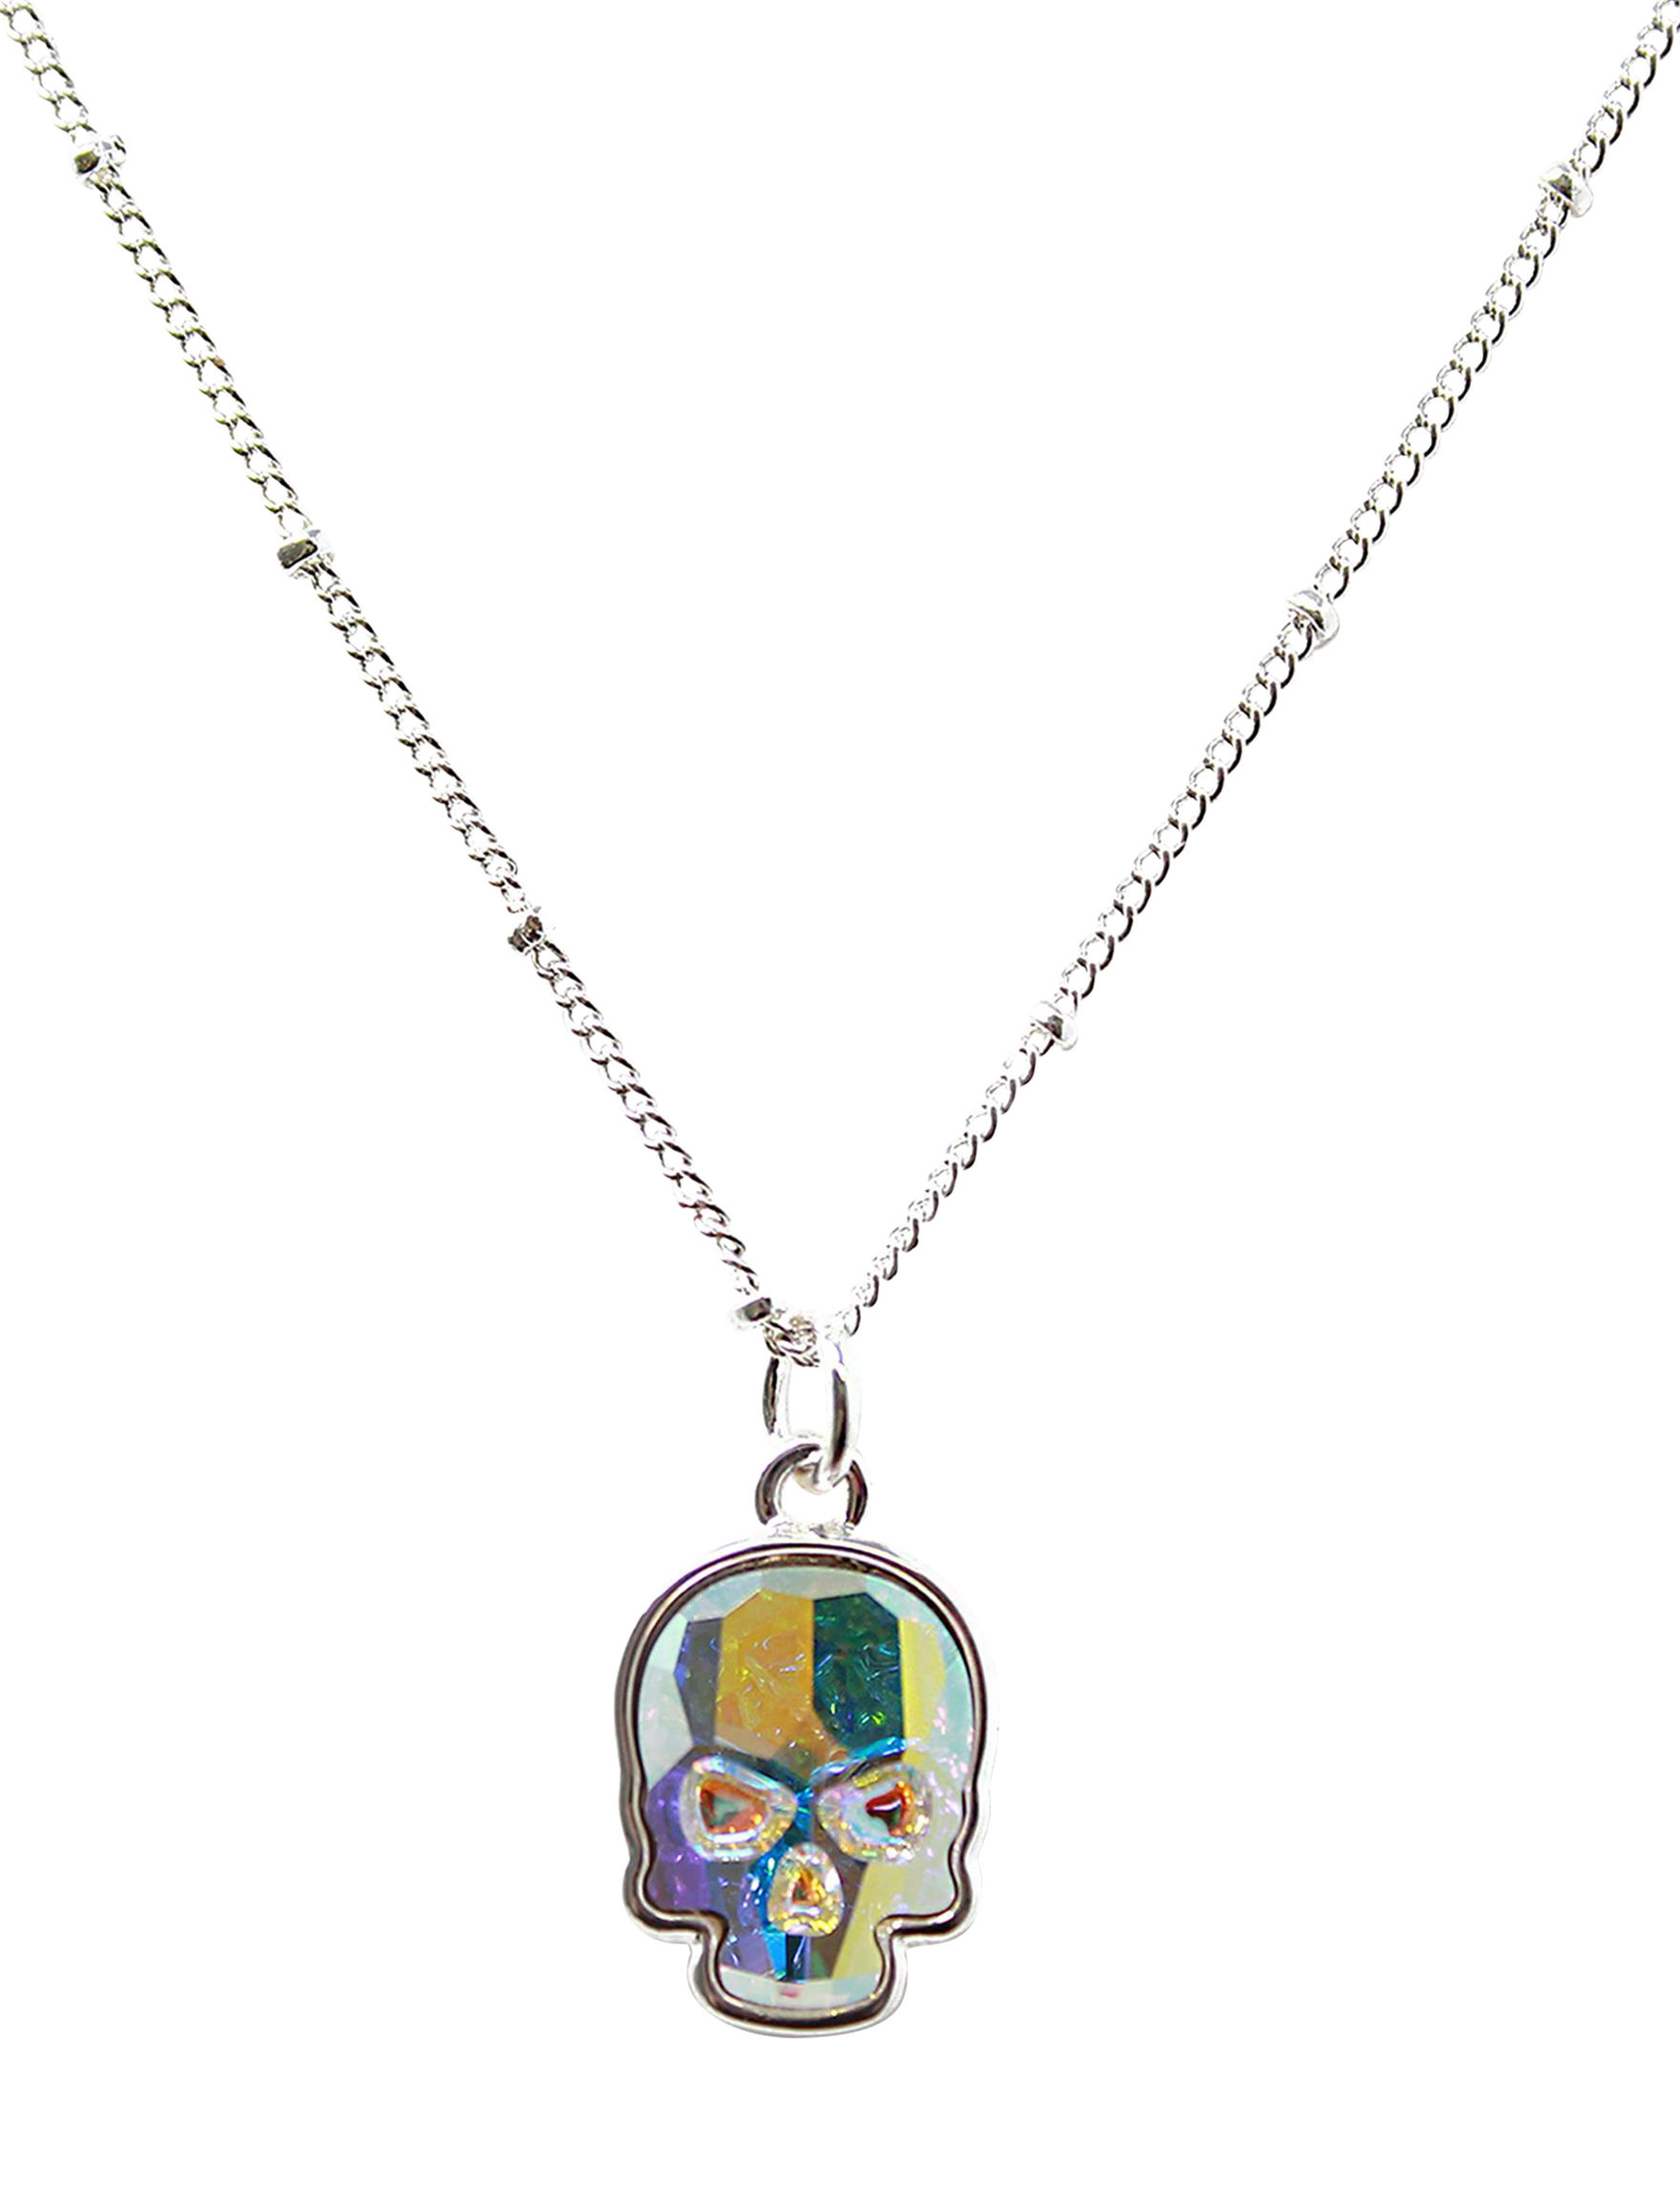 L & J Crystal Skull Necklaces & Pendants Fine Jewelry